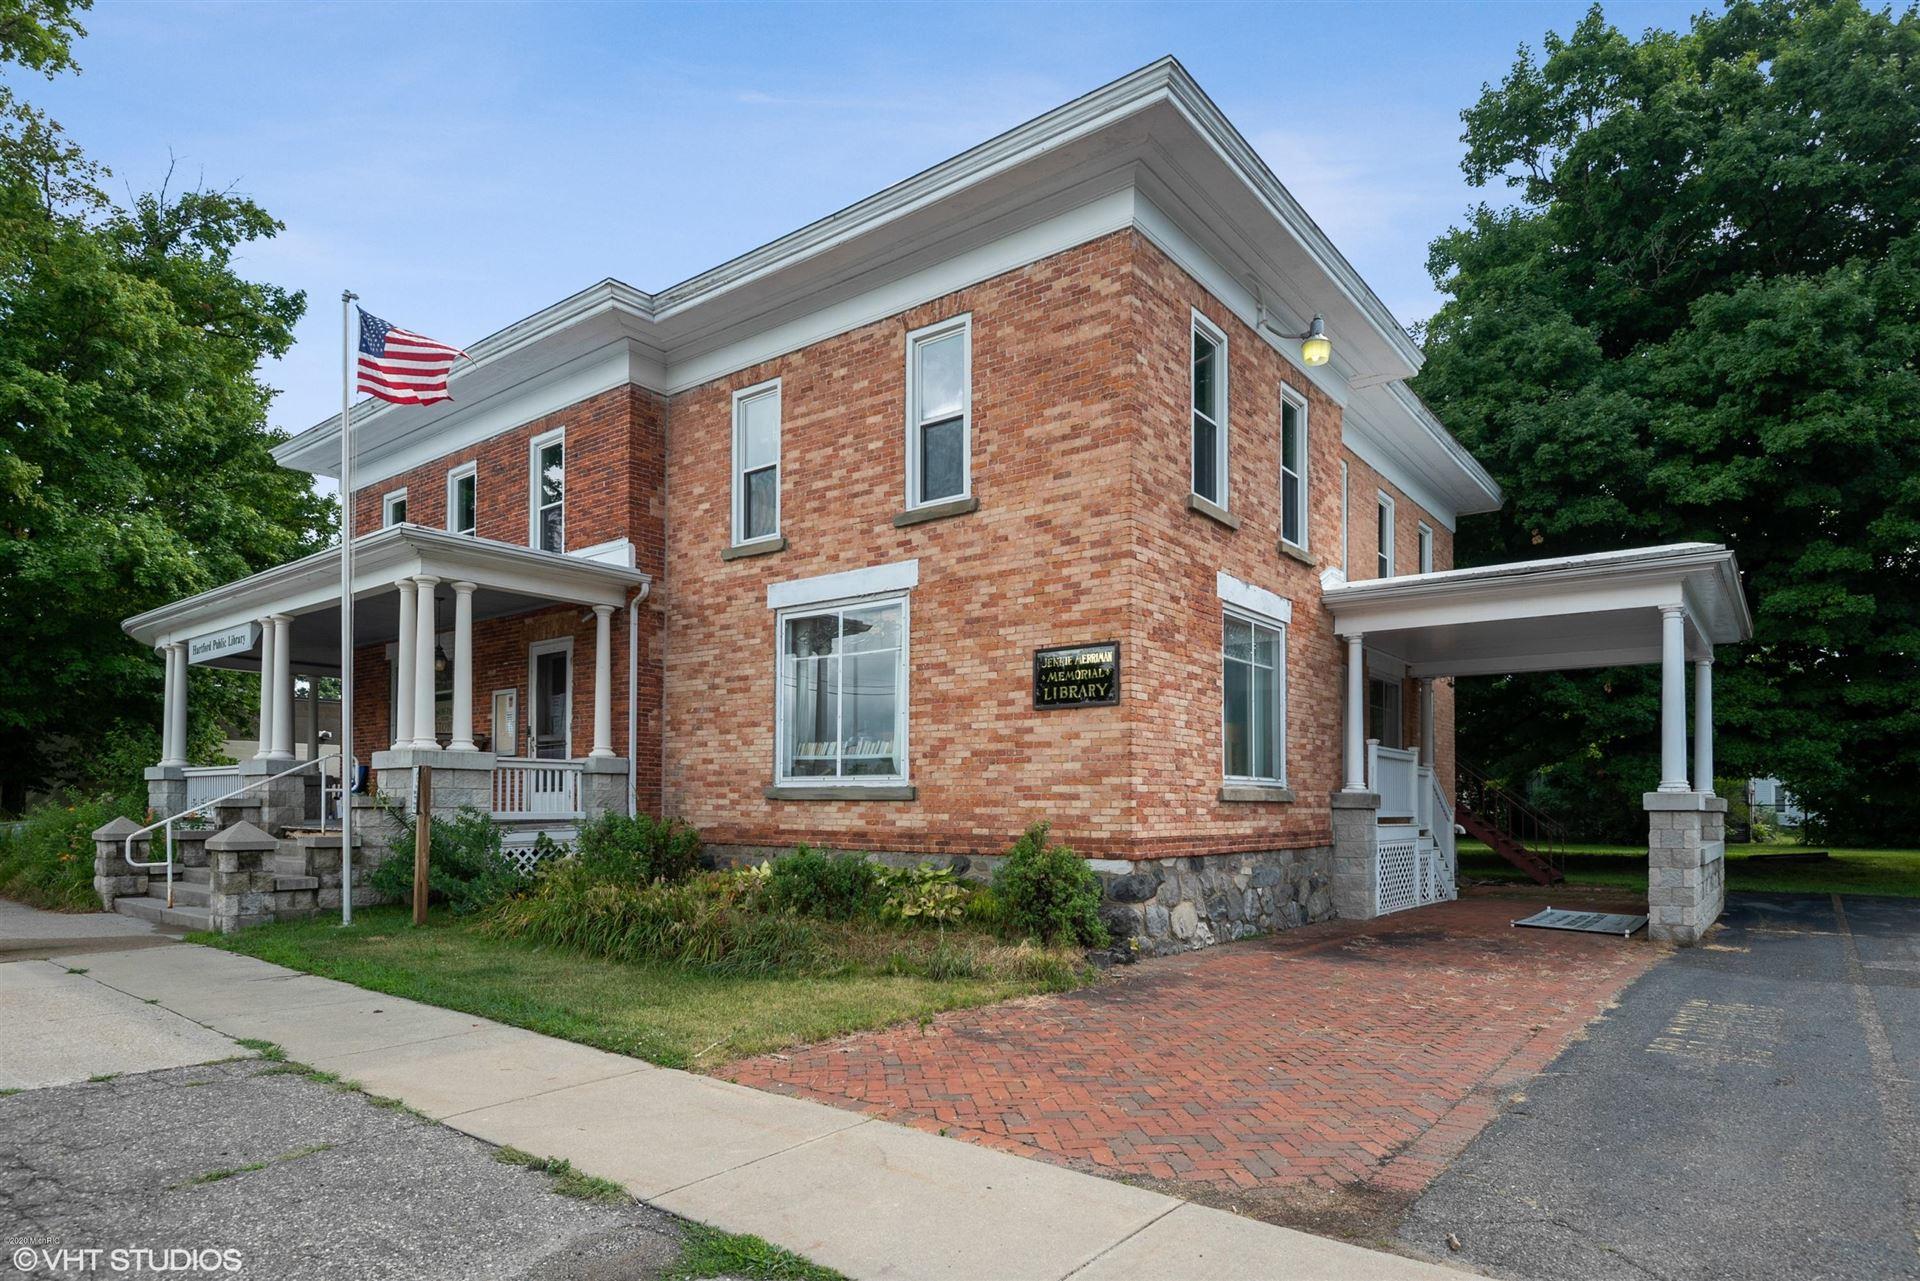 15 Franklin Street, Hartford, MI 49057 - MLS#: 20027018